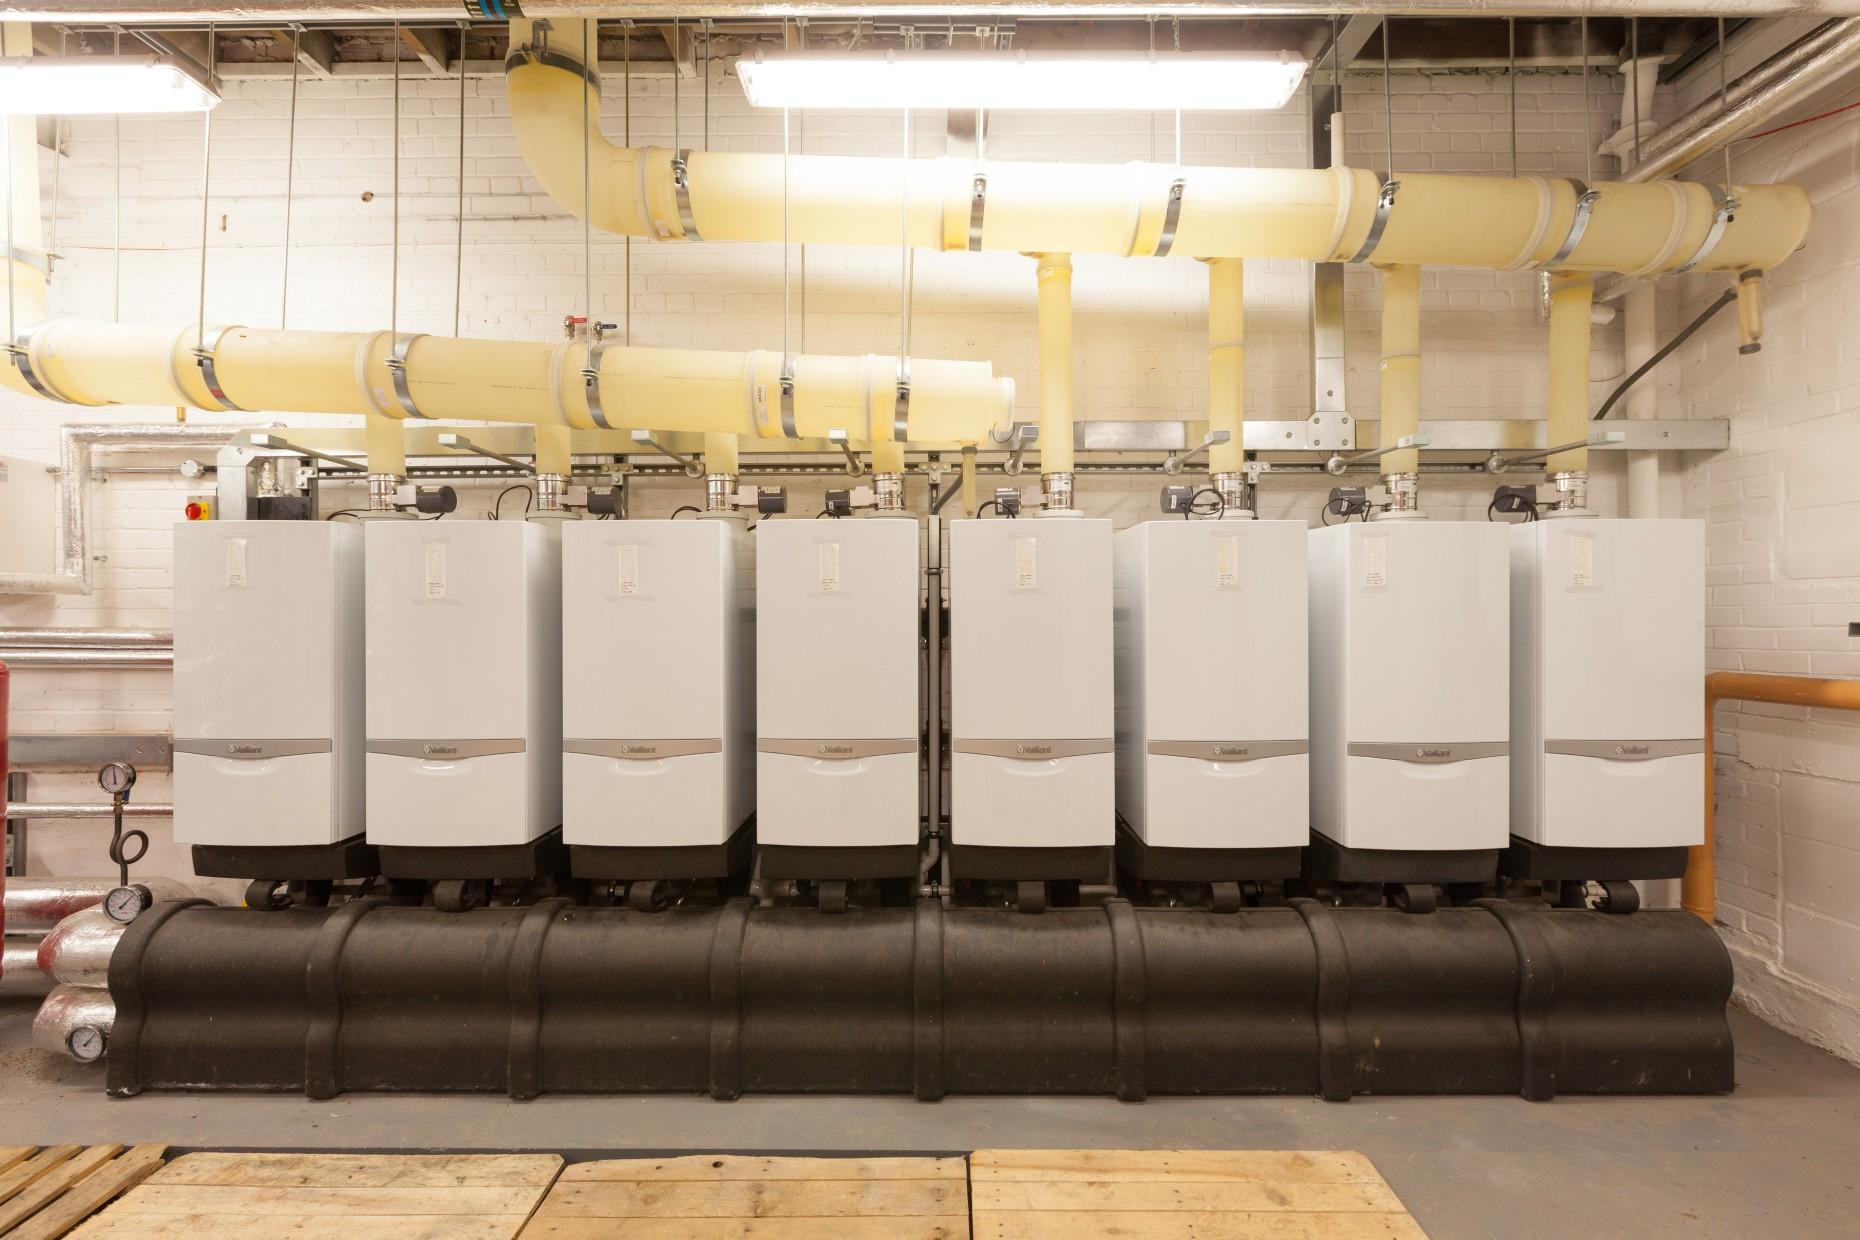 ecotec-80-100-120-kw-wall-hung-boiler-1136948-format-flex-height